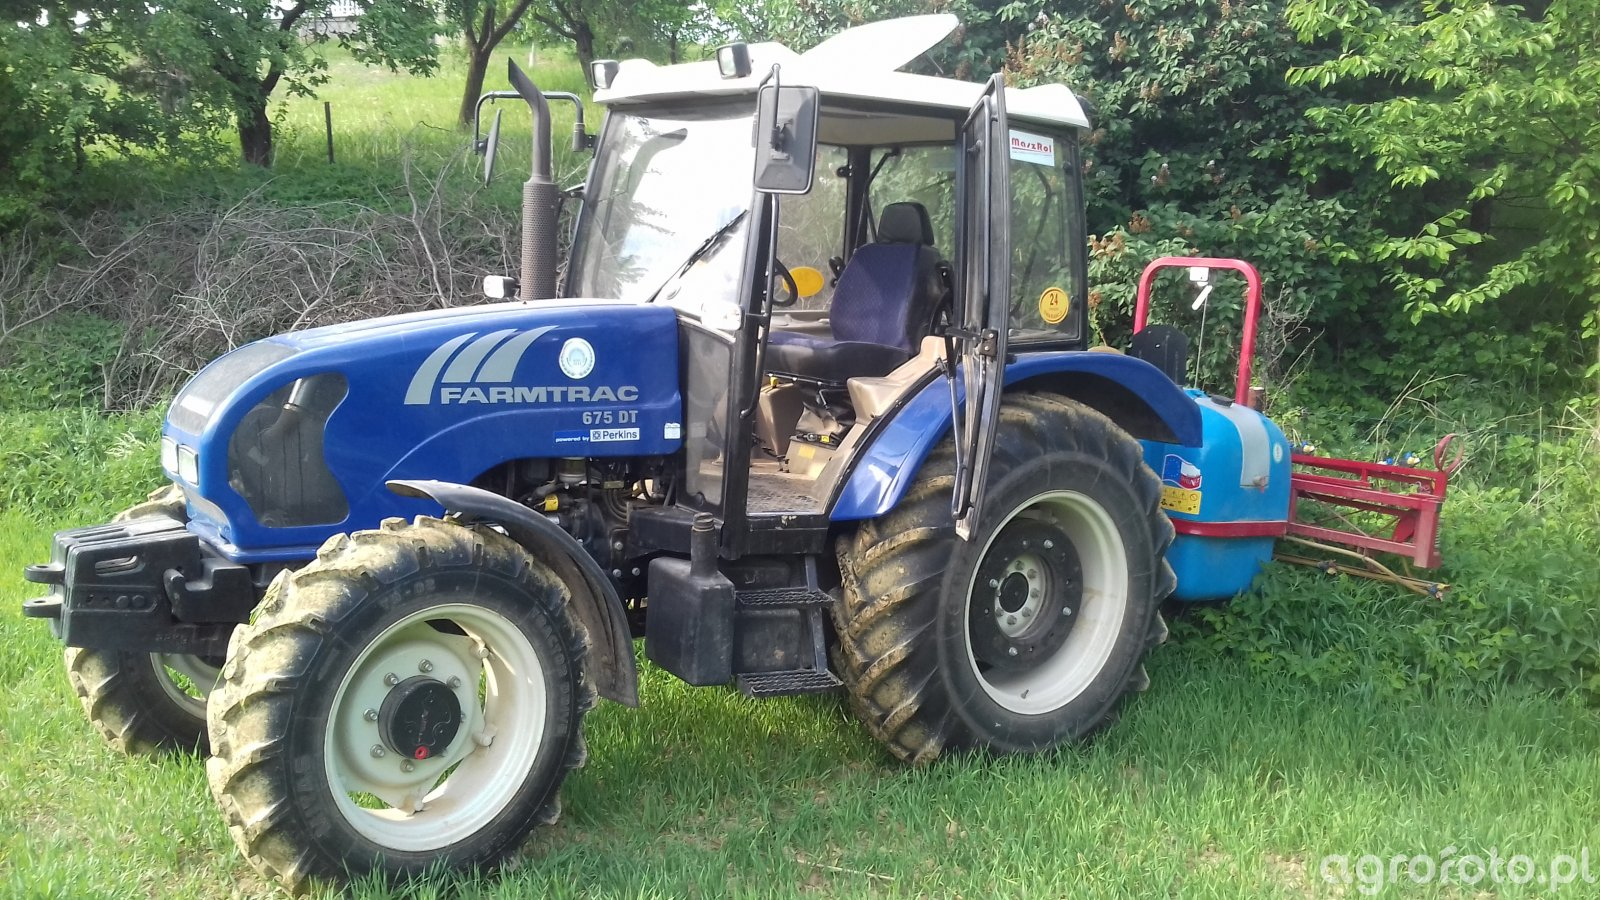 Farmtrac 675 DT Biardzki 600 l